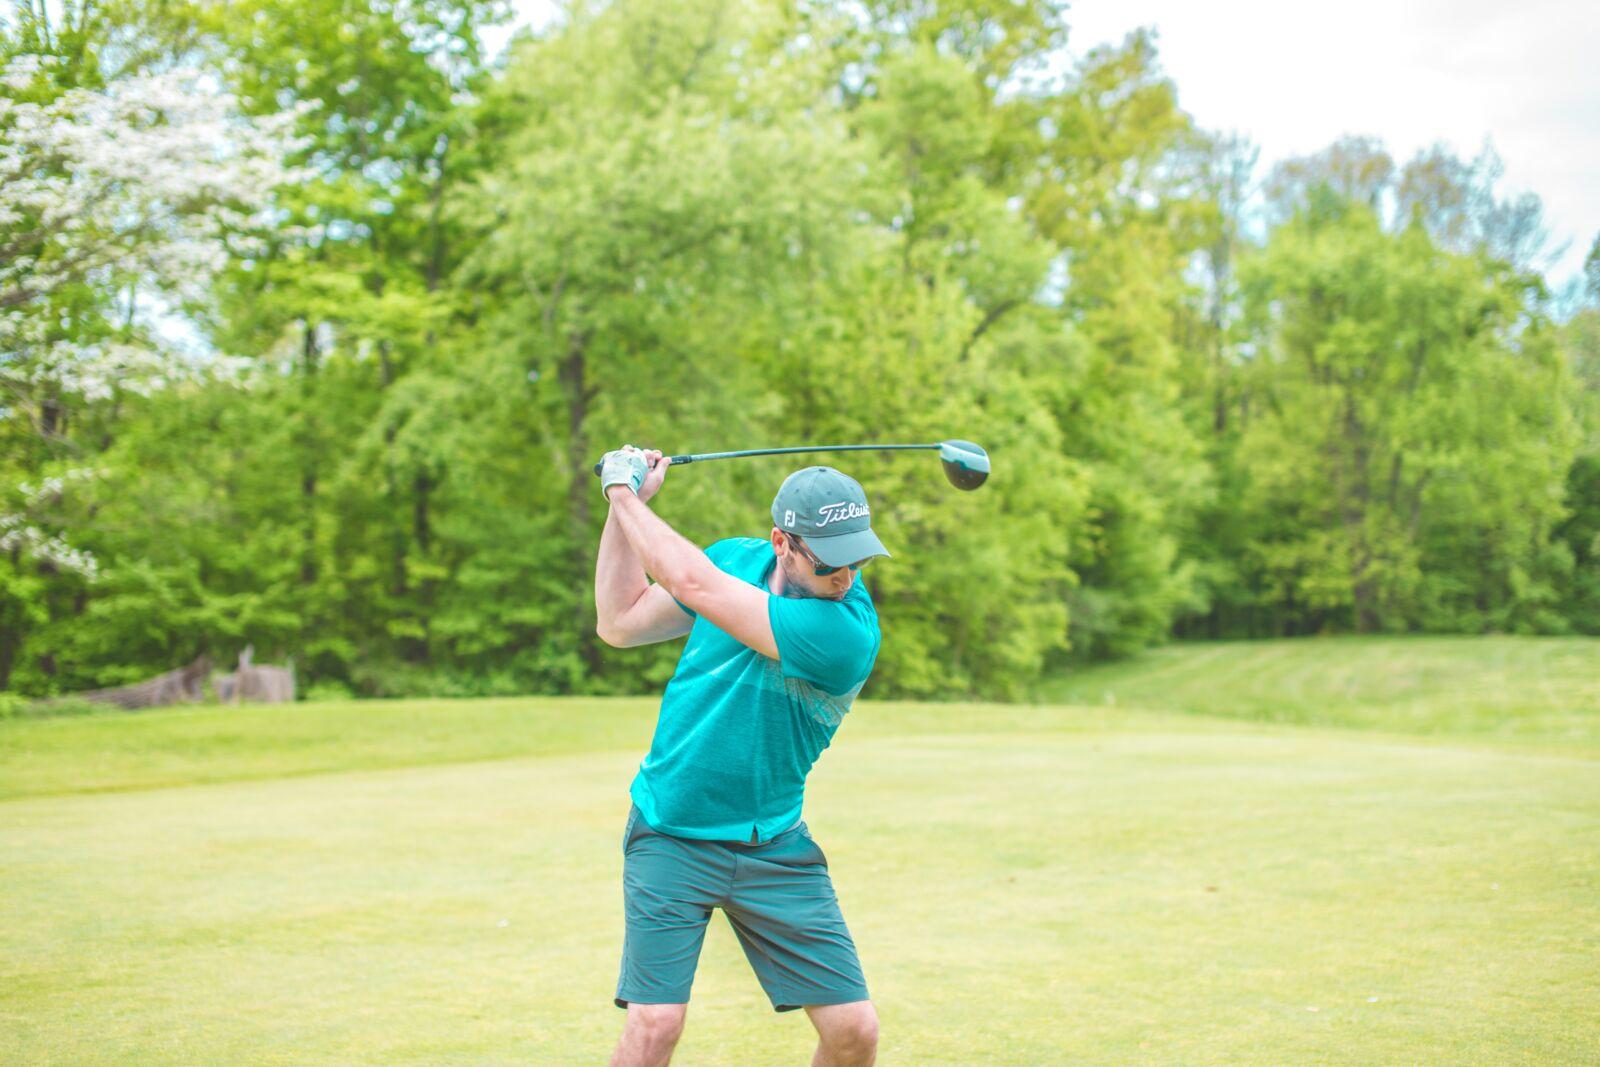 Man swinging to hit golf ball